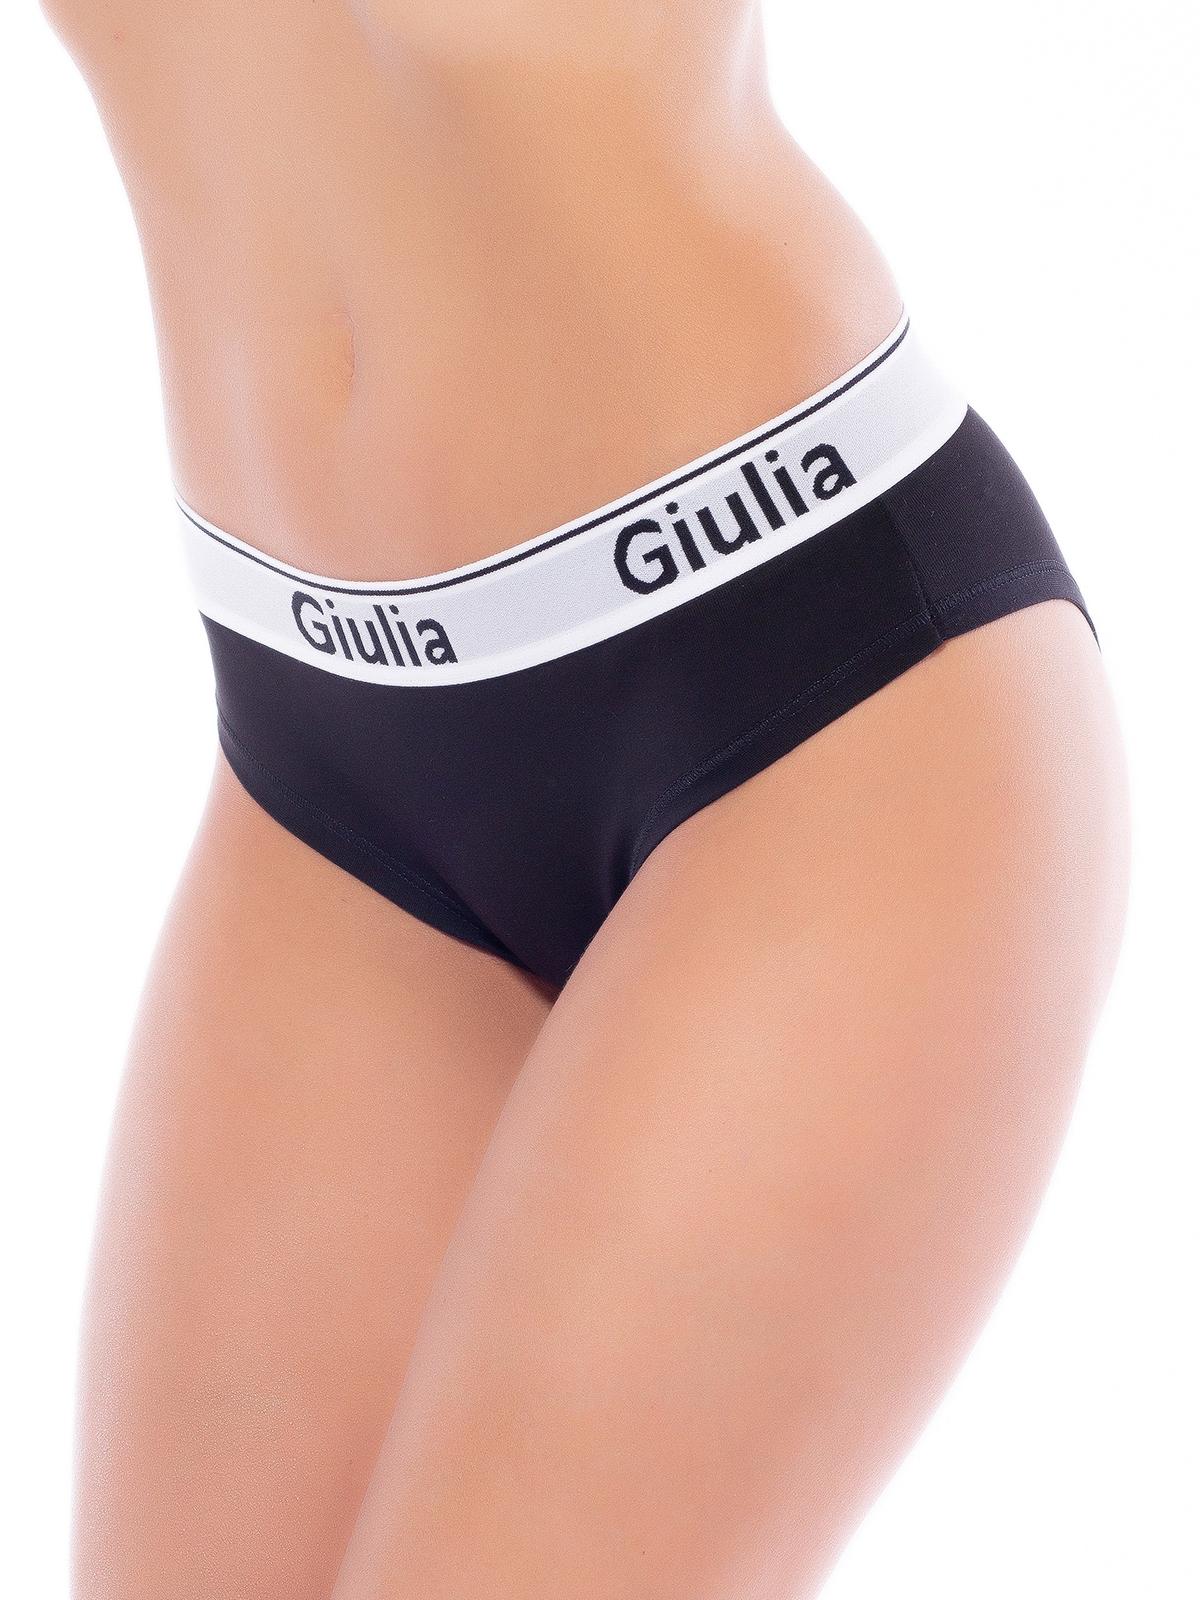 Трусы Cotton Slip 01 Giulia